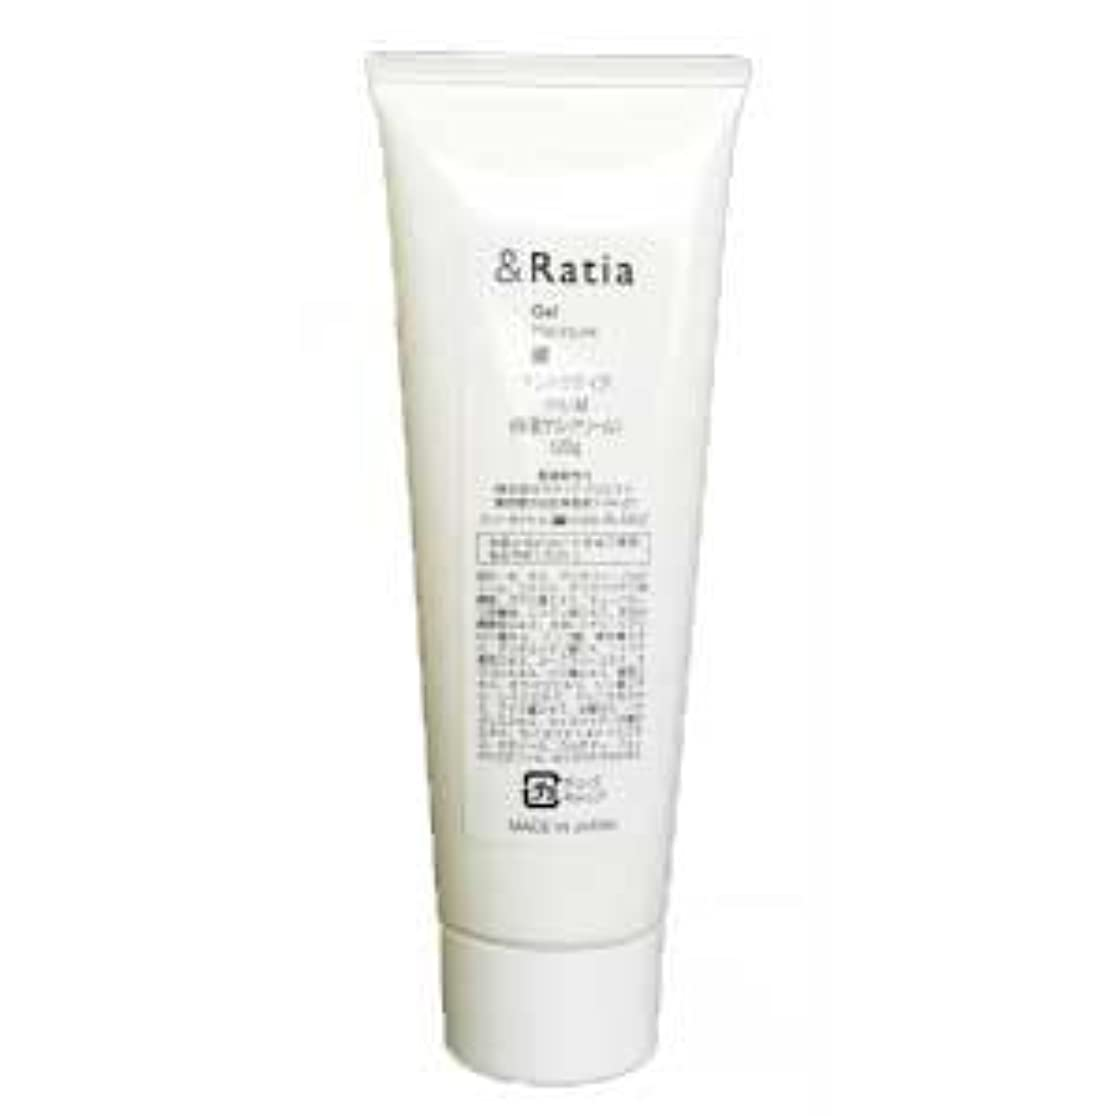 &Ratia アンドラティア  ゲルM 【脂性肌?乾燥肌?混合肌】業務用ARSG022 120g [cosme]